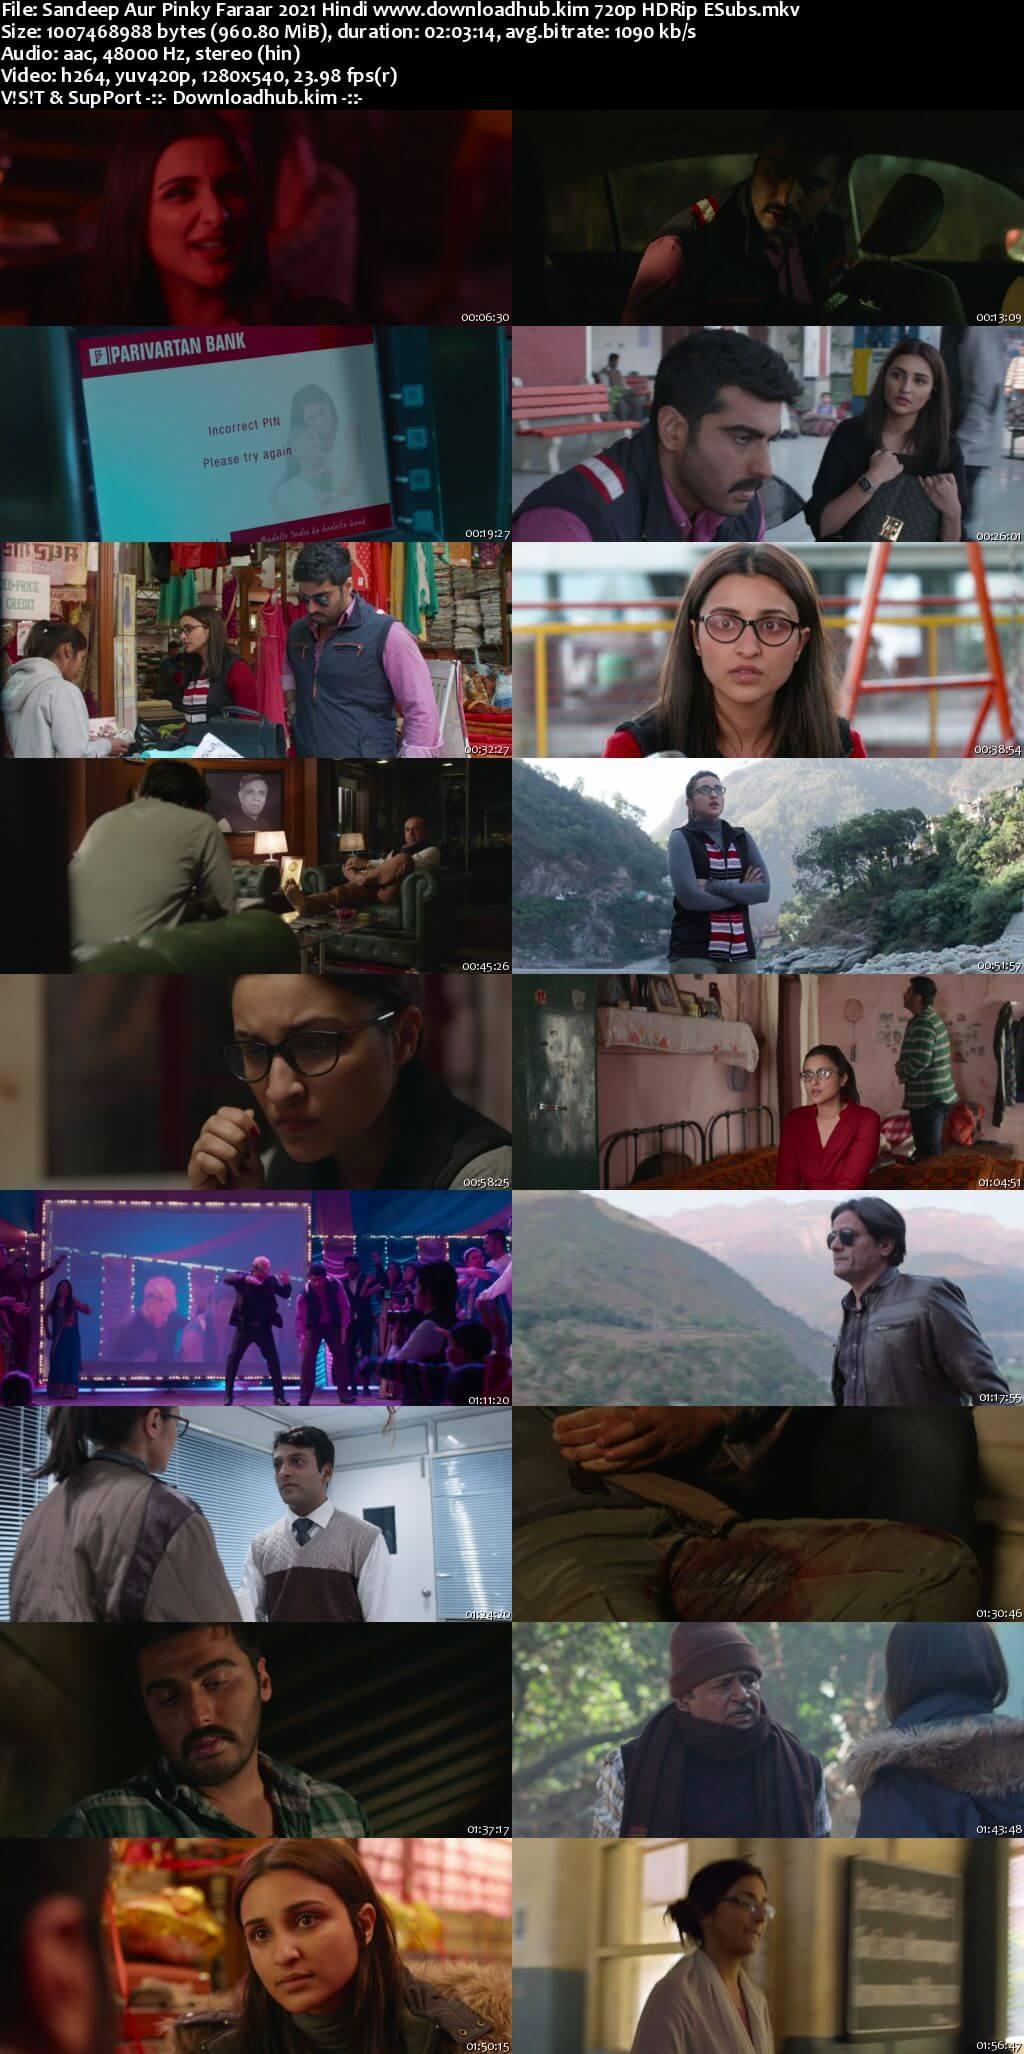 Sandeep Aur Pinky Faraar 2021 Hindi 720p HDRip ESubs